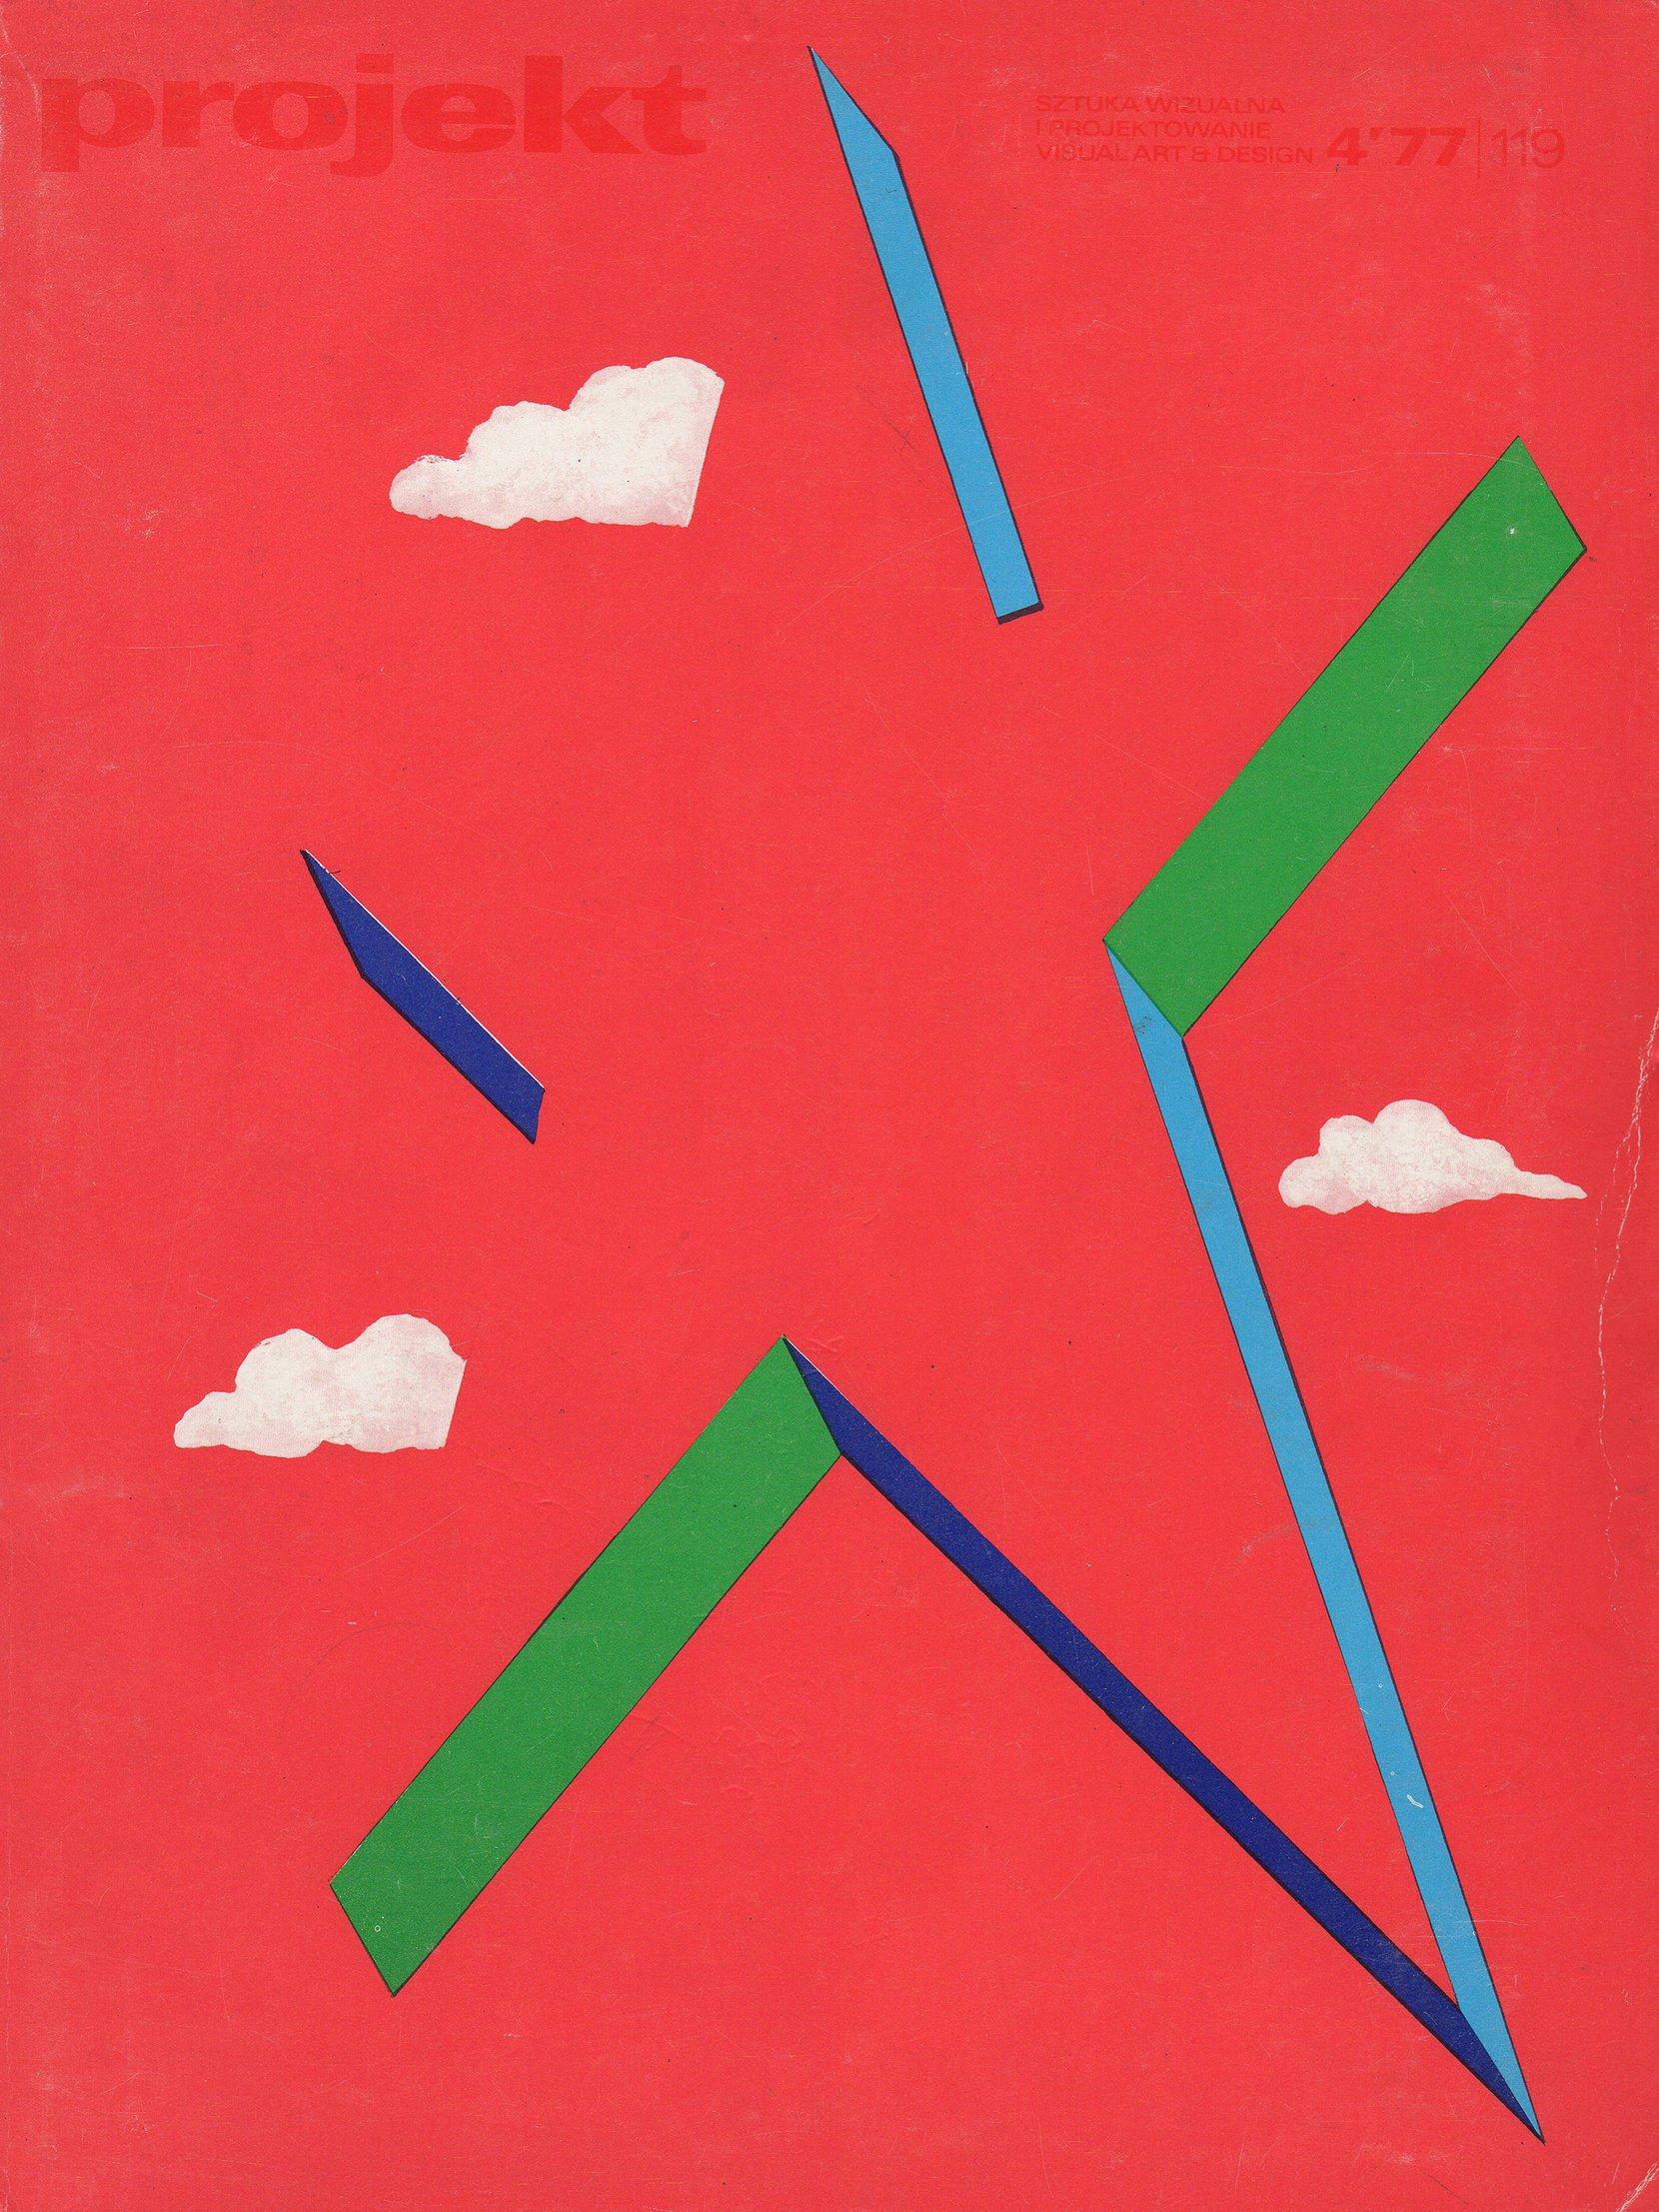 """projekt"" magazine, 1977-4 periodicals art & culture"